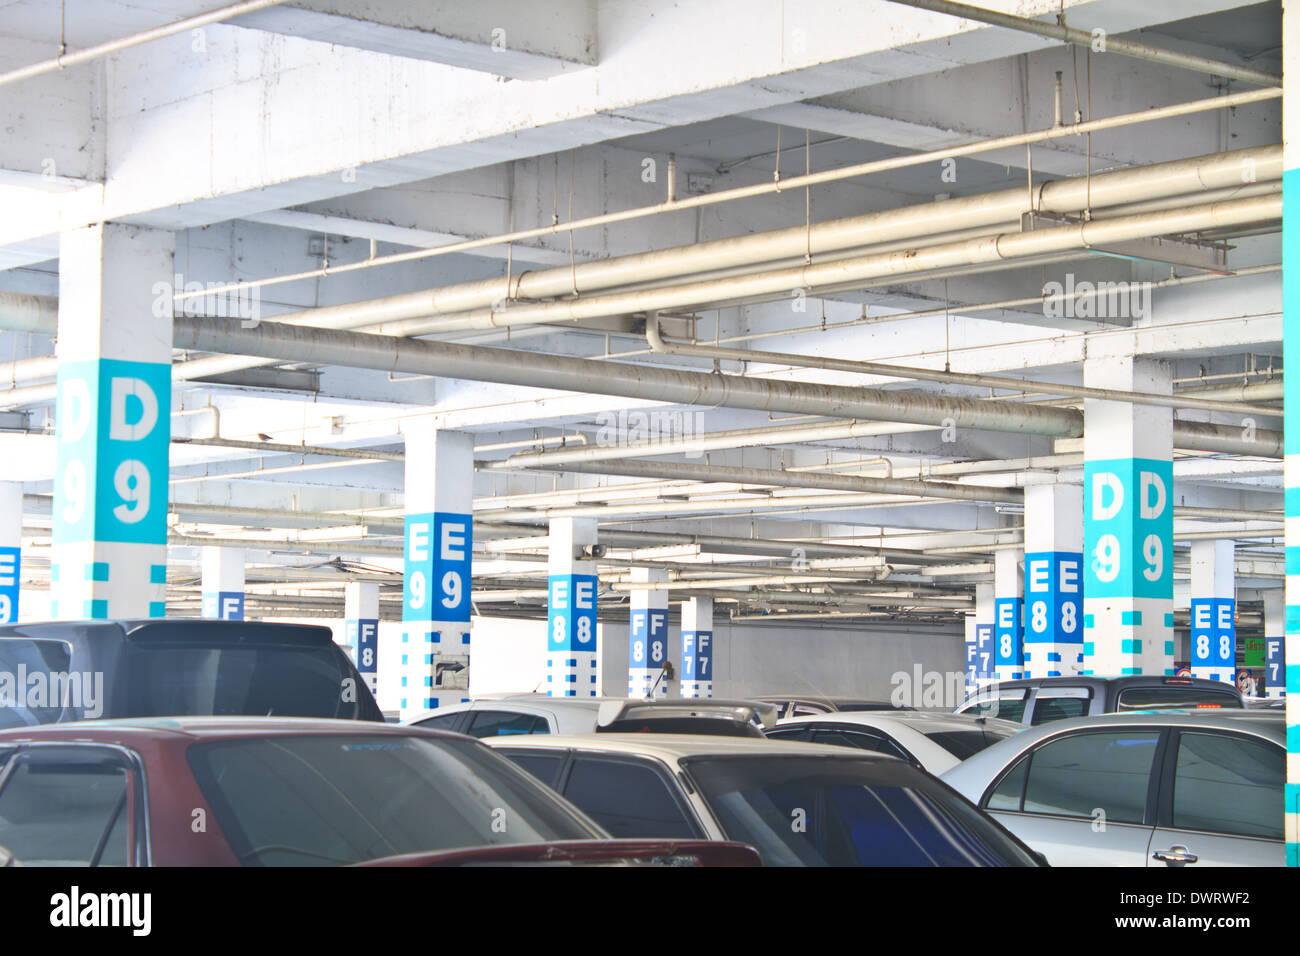 Driveway underground parking stock photos driveway for Garage europe auto center fresnes